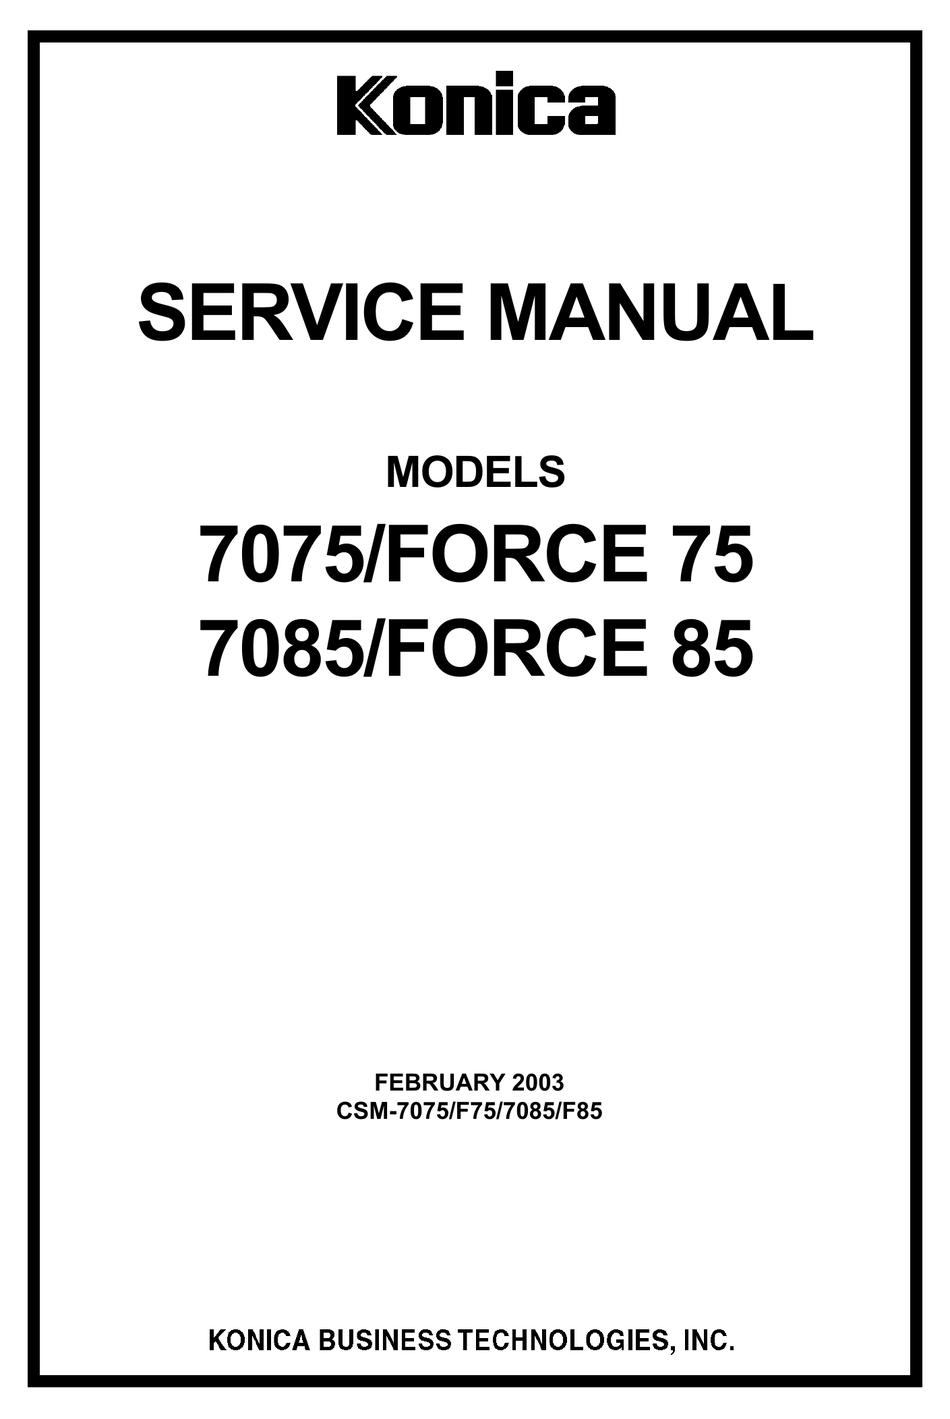 KONICA MINOLTA 7085/FORCE 85 SERVICE MANUAL Pdf Download